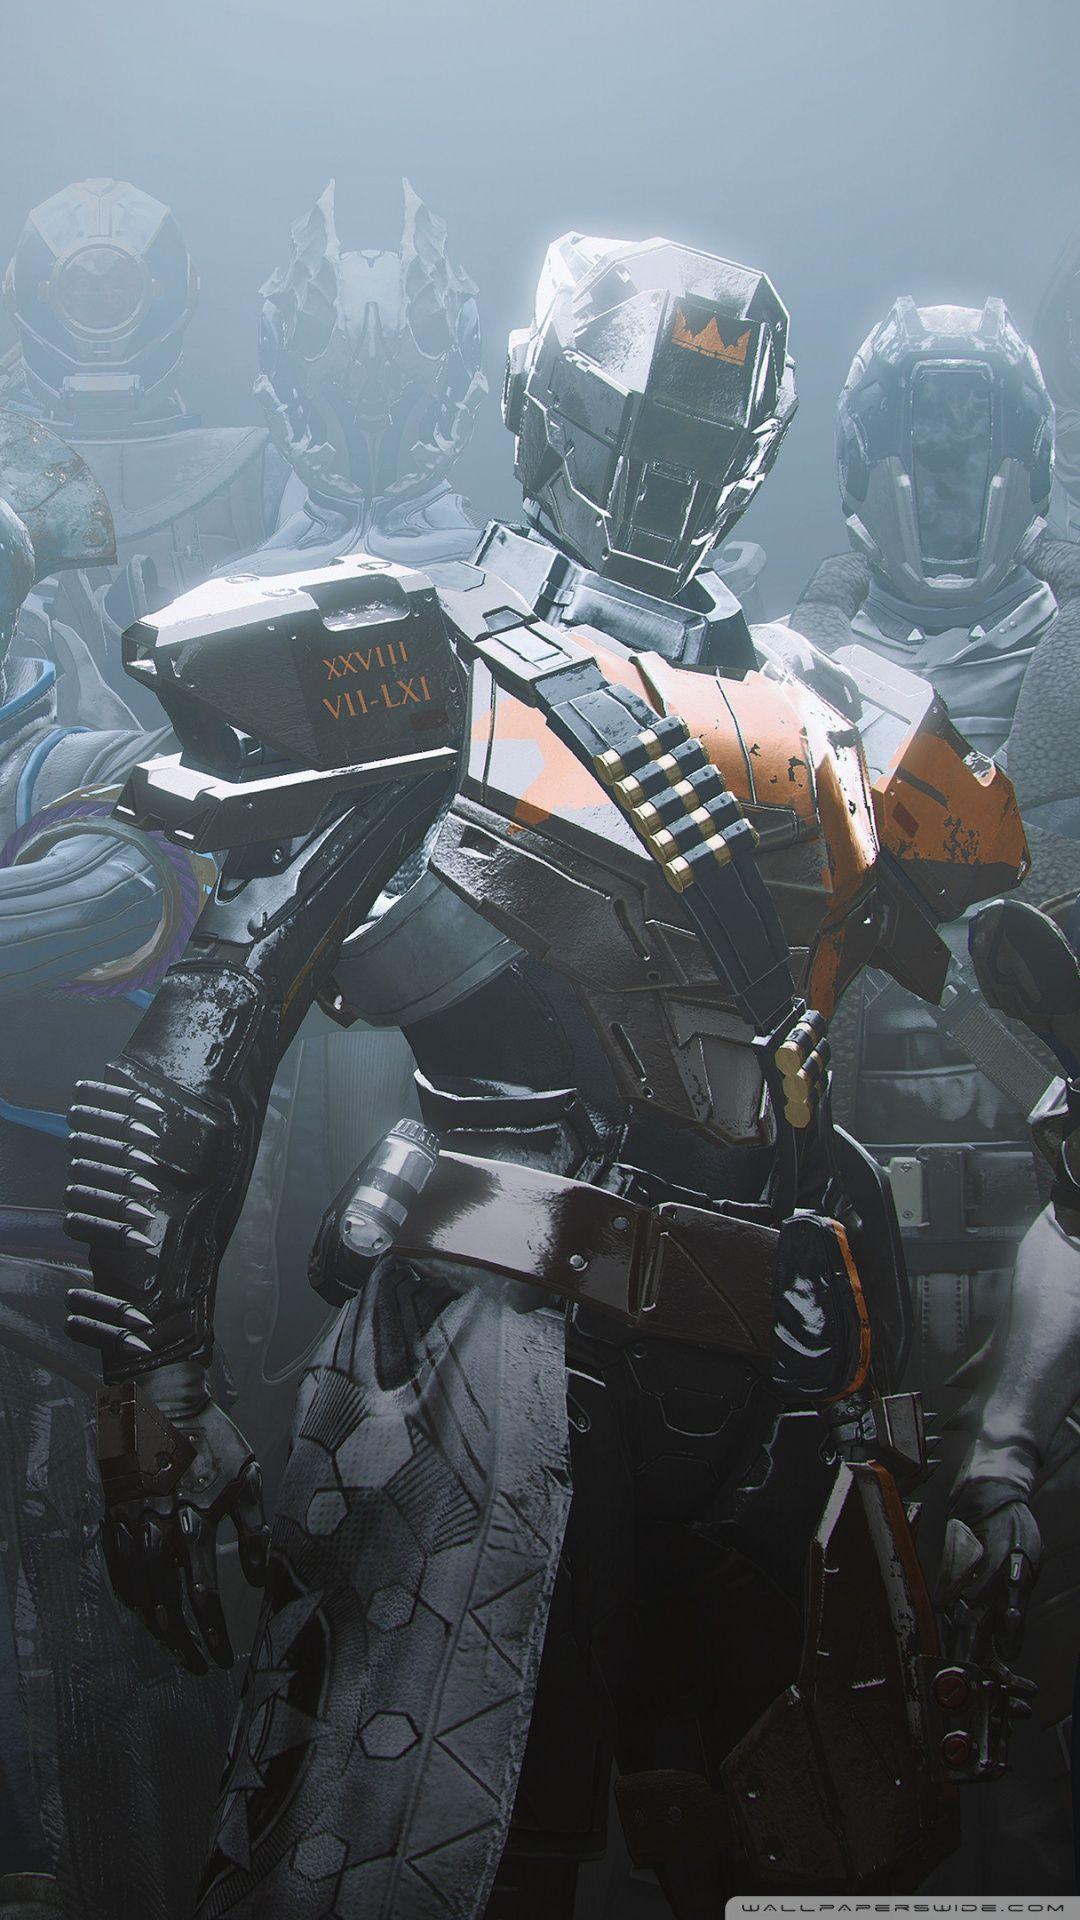 Destiny 2 Shadowkeep Background Iphone Background Art Blade Runner Iphone Wallpaper